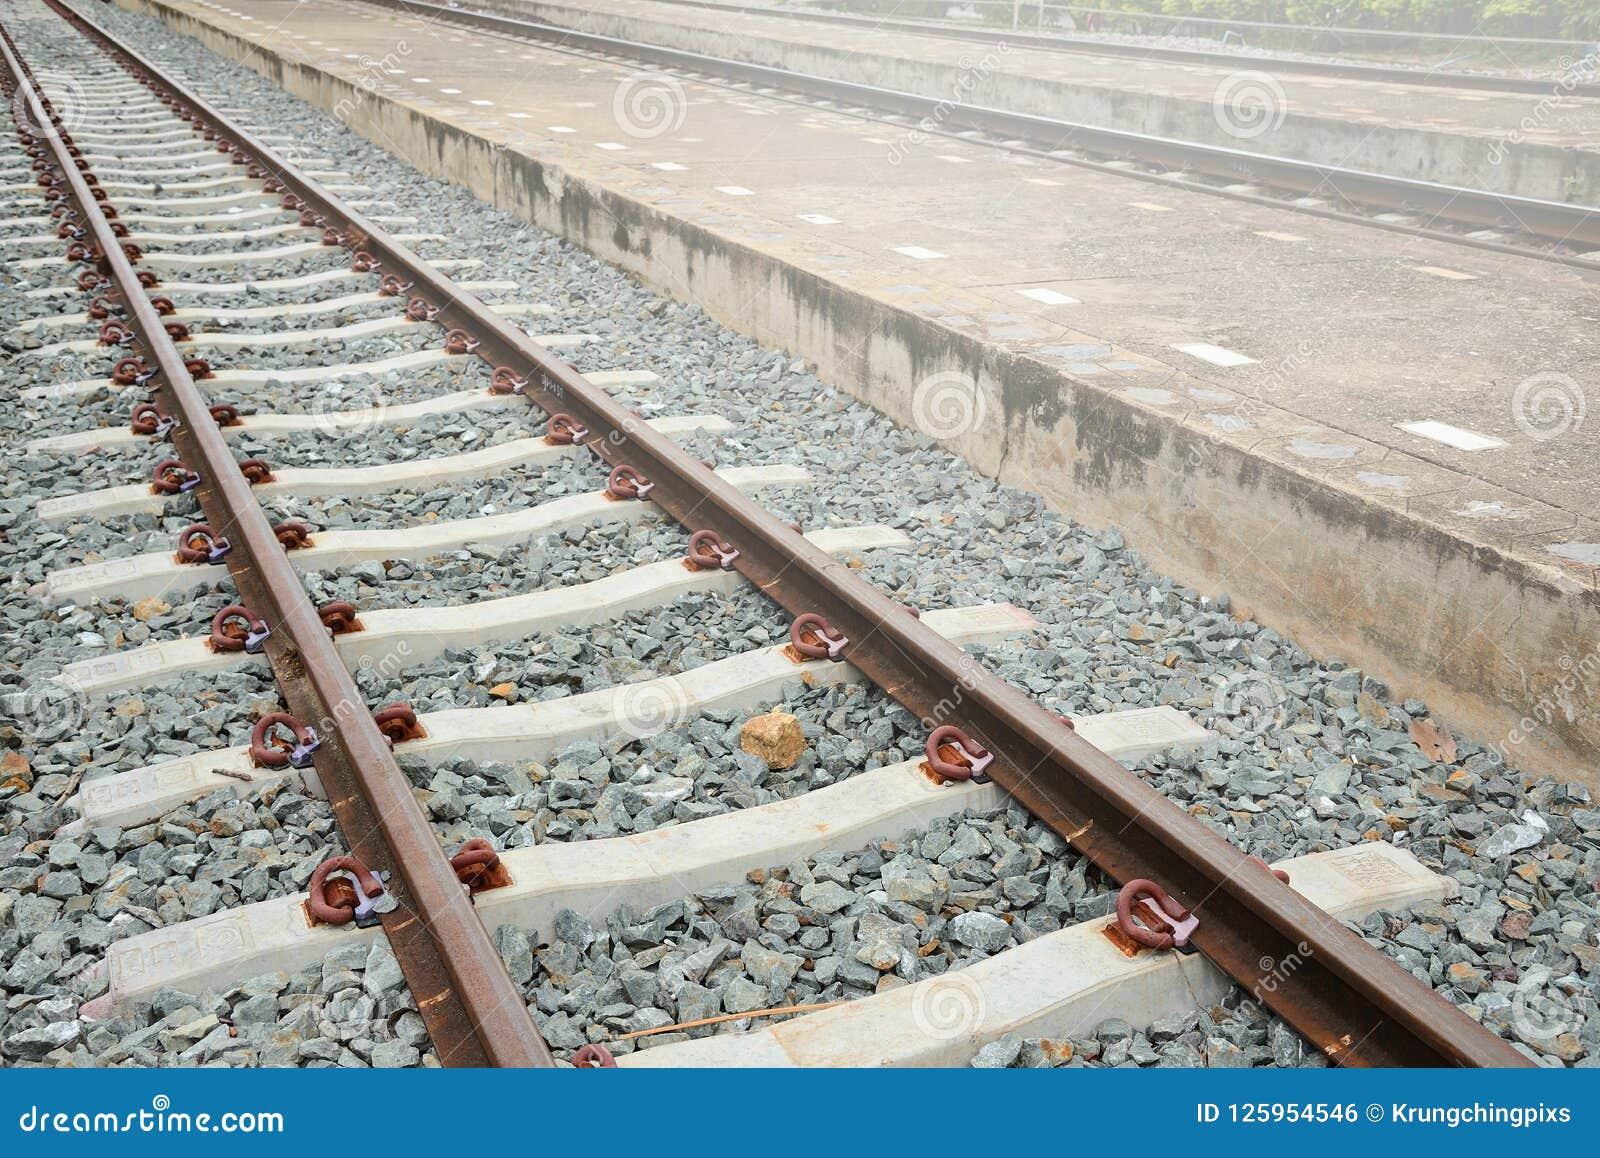 Railway Track With Concrete Platform  Stock Photo - Image of